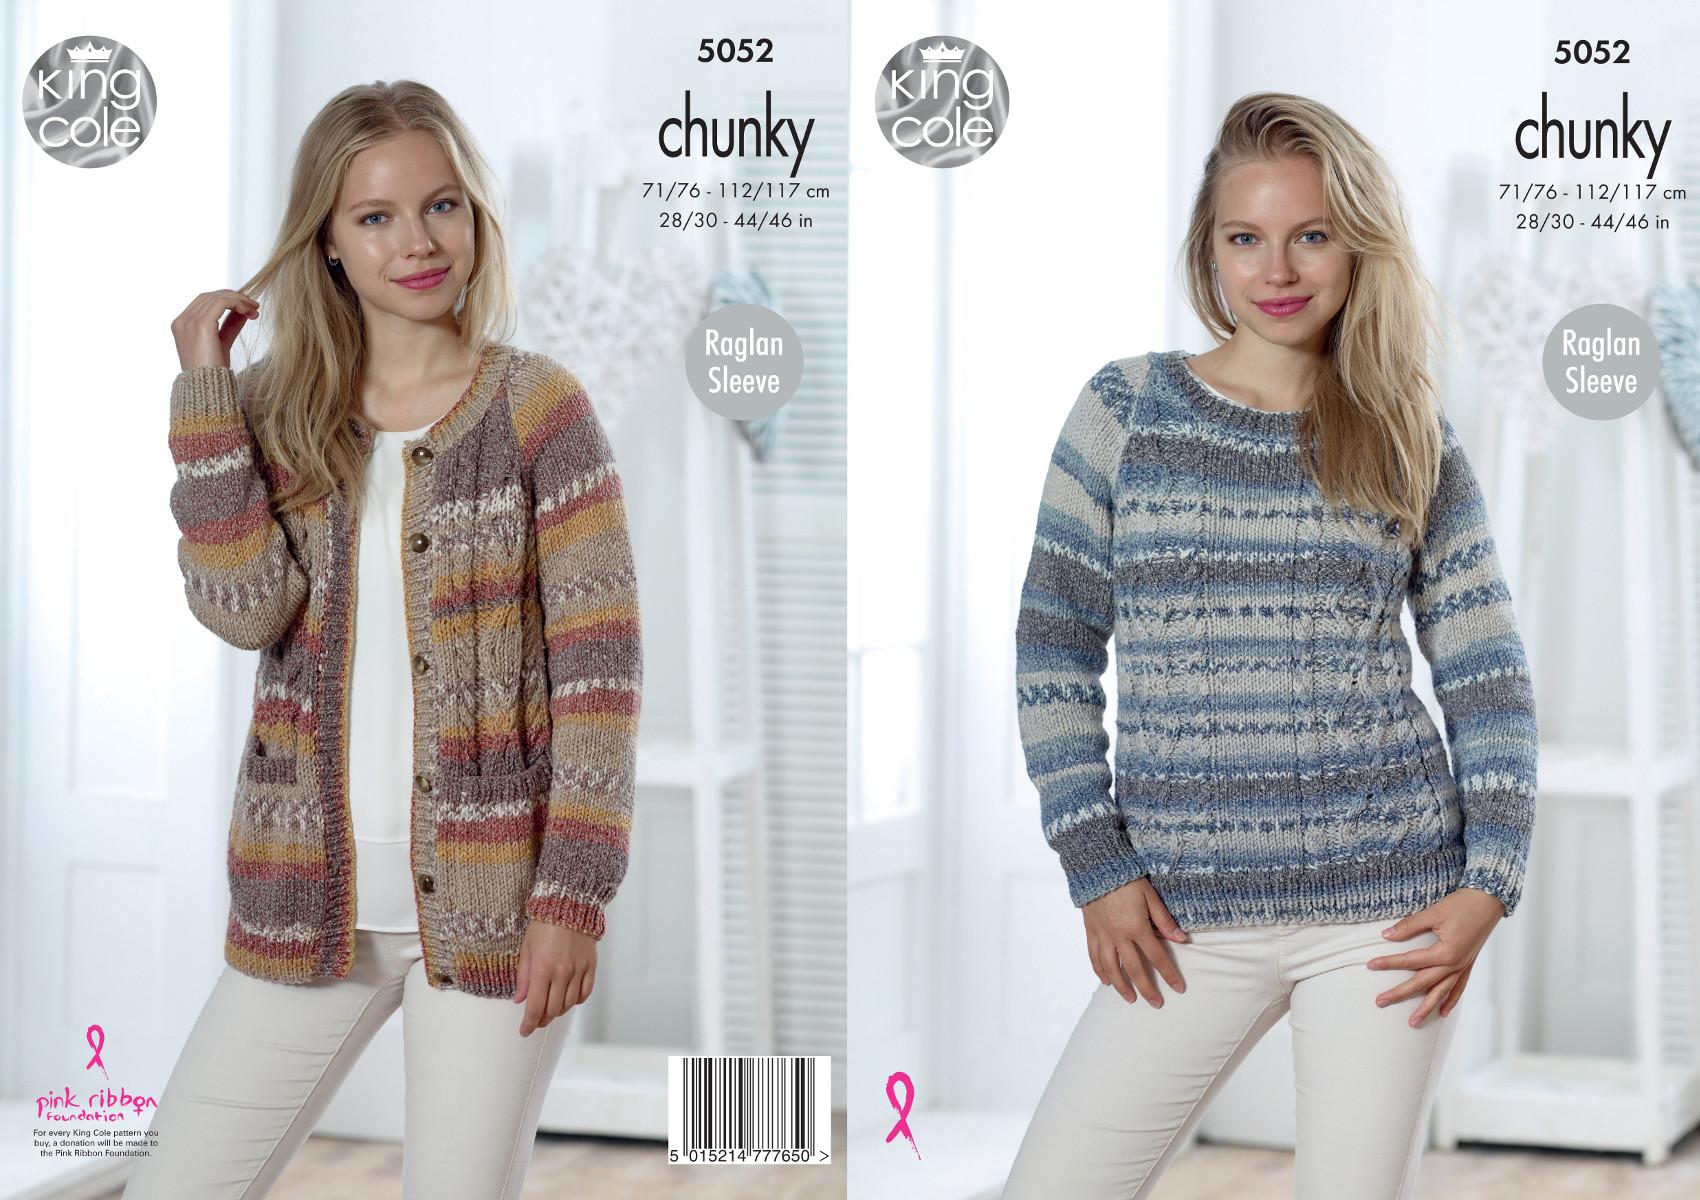 Details about King Cole Ladies Chunky Knitting Pattern Raglan Sleeve  Cardigan & Sweater 5052